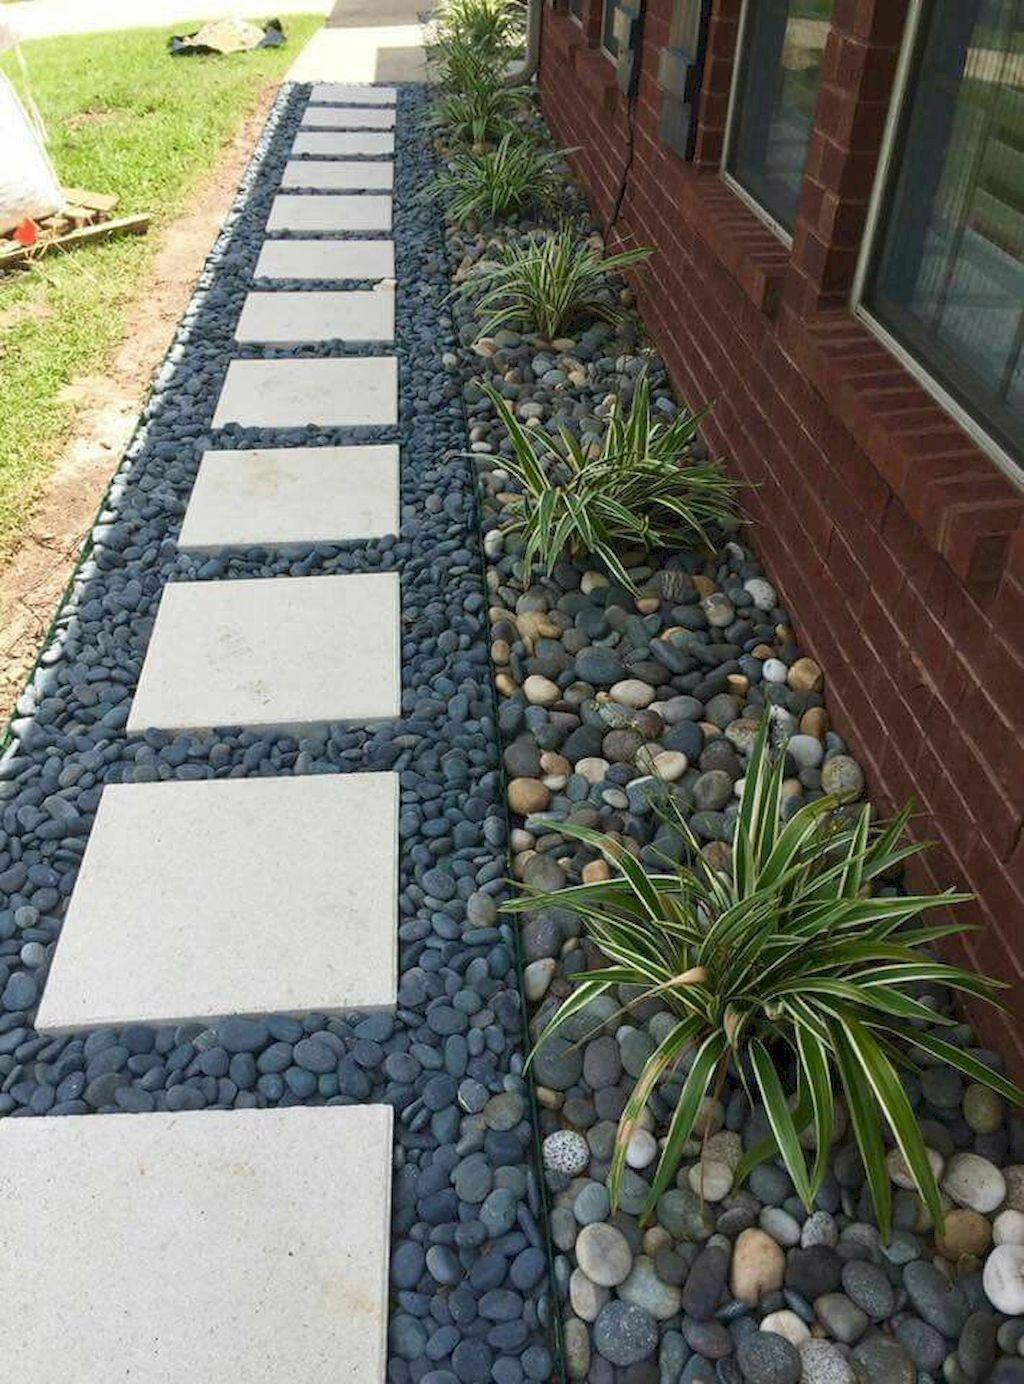 55 Stunning Side Yard Garden Landscaping Ideas - 99decor #landscapingfrontyard